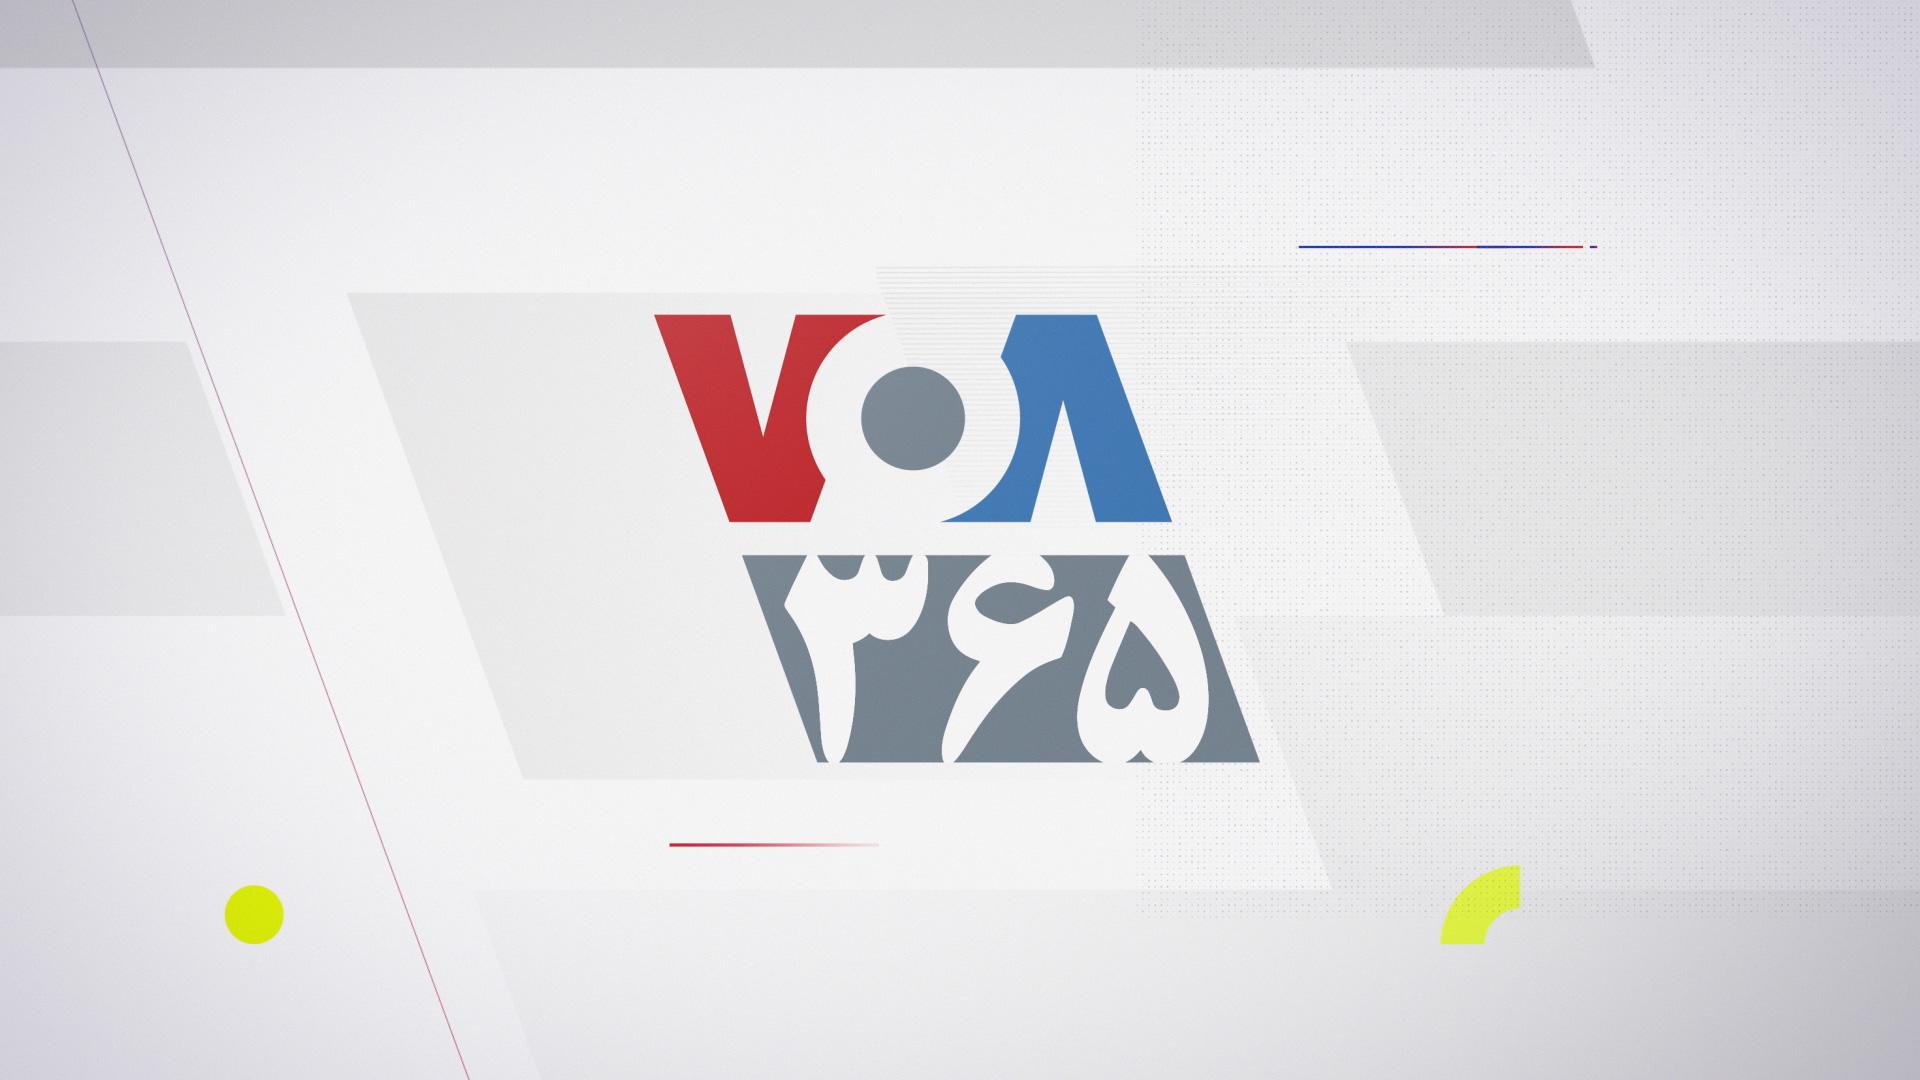 VOA_24_ID_10S-(0;00;06;19).jpg